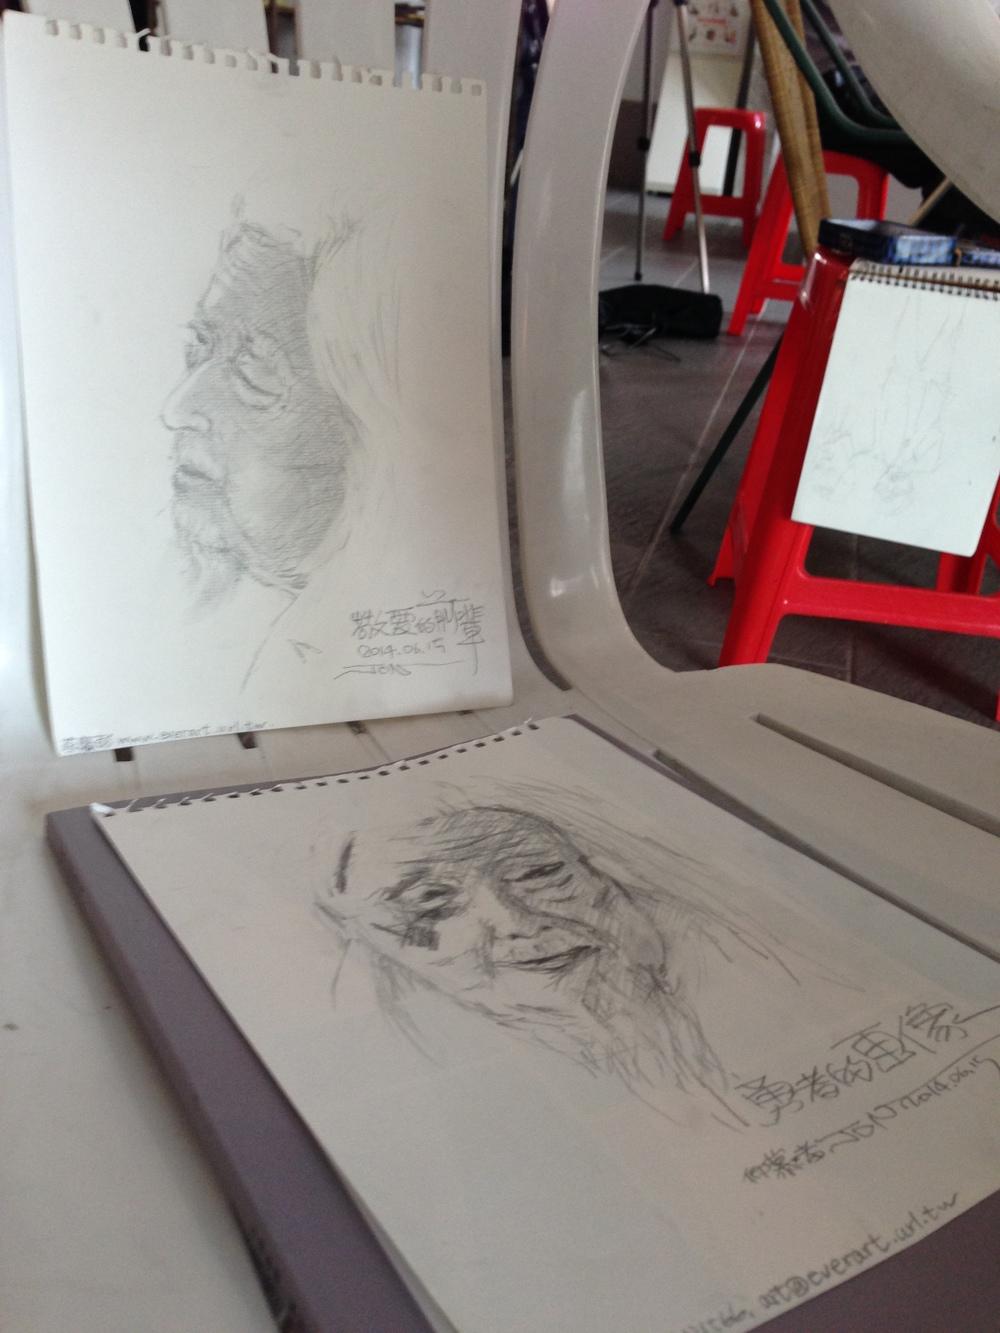 6.15- 2 sketches.JPG